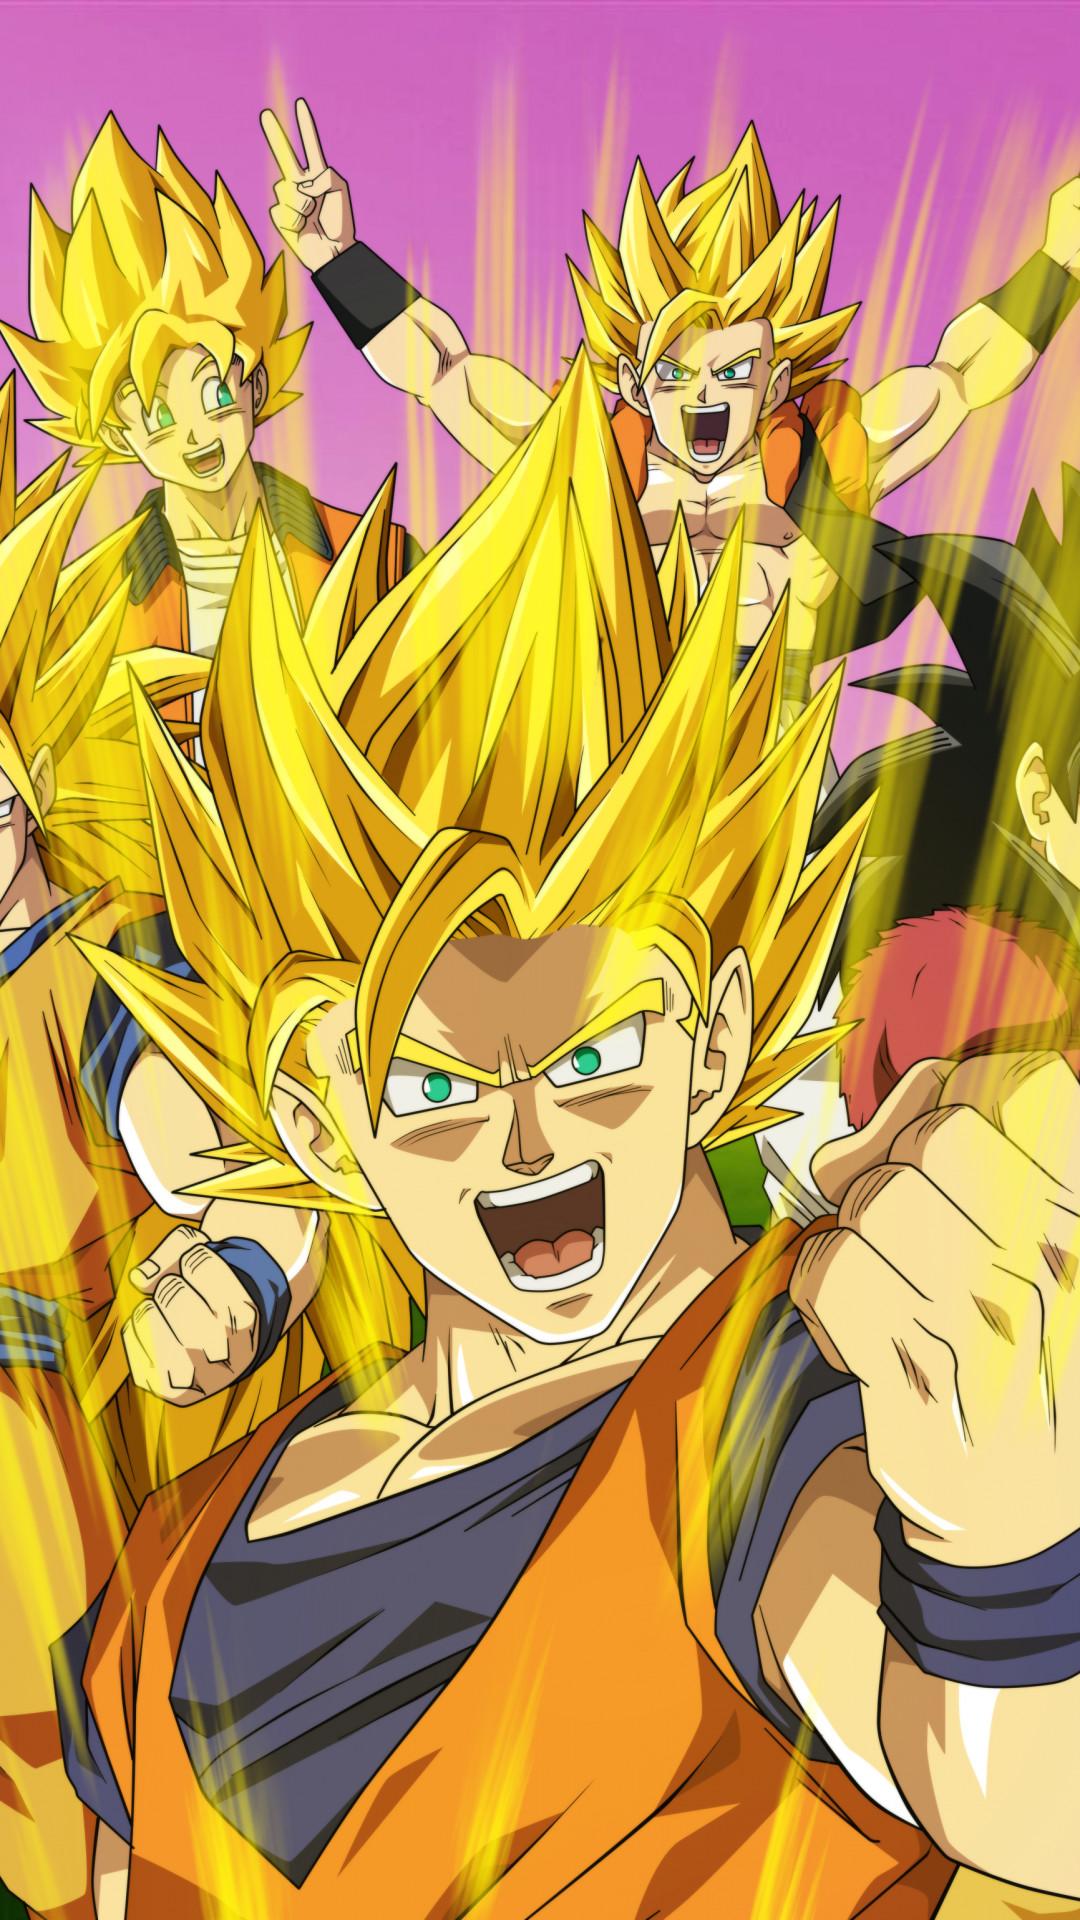 iPhone 6 Plus – Anime/Dragon Ball Z – Wallpaper ID: 598193